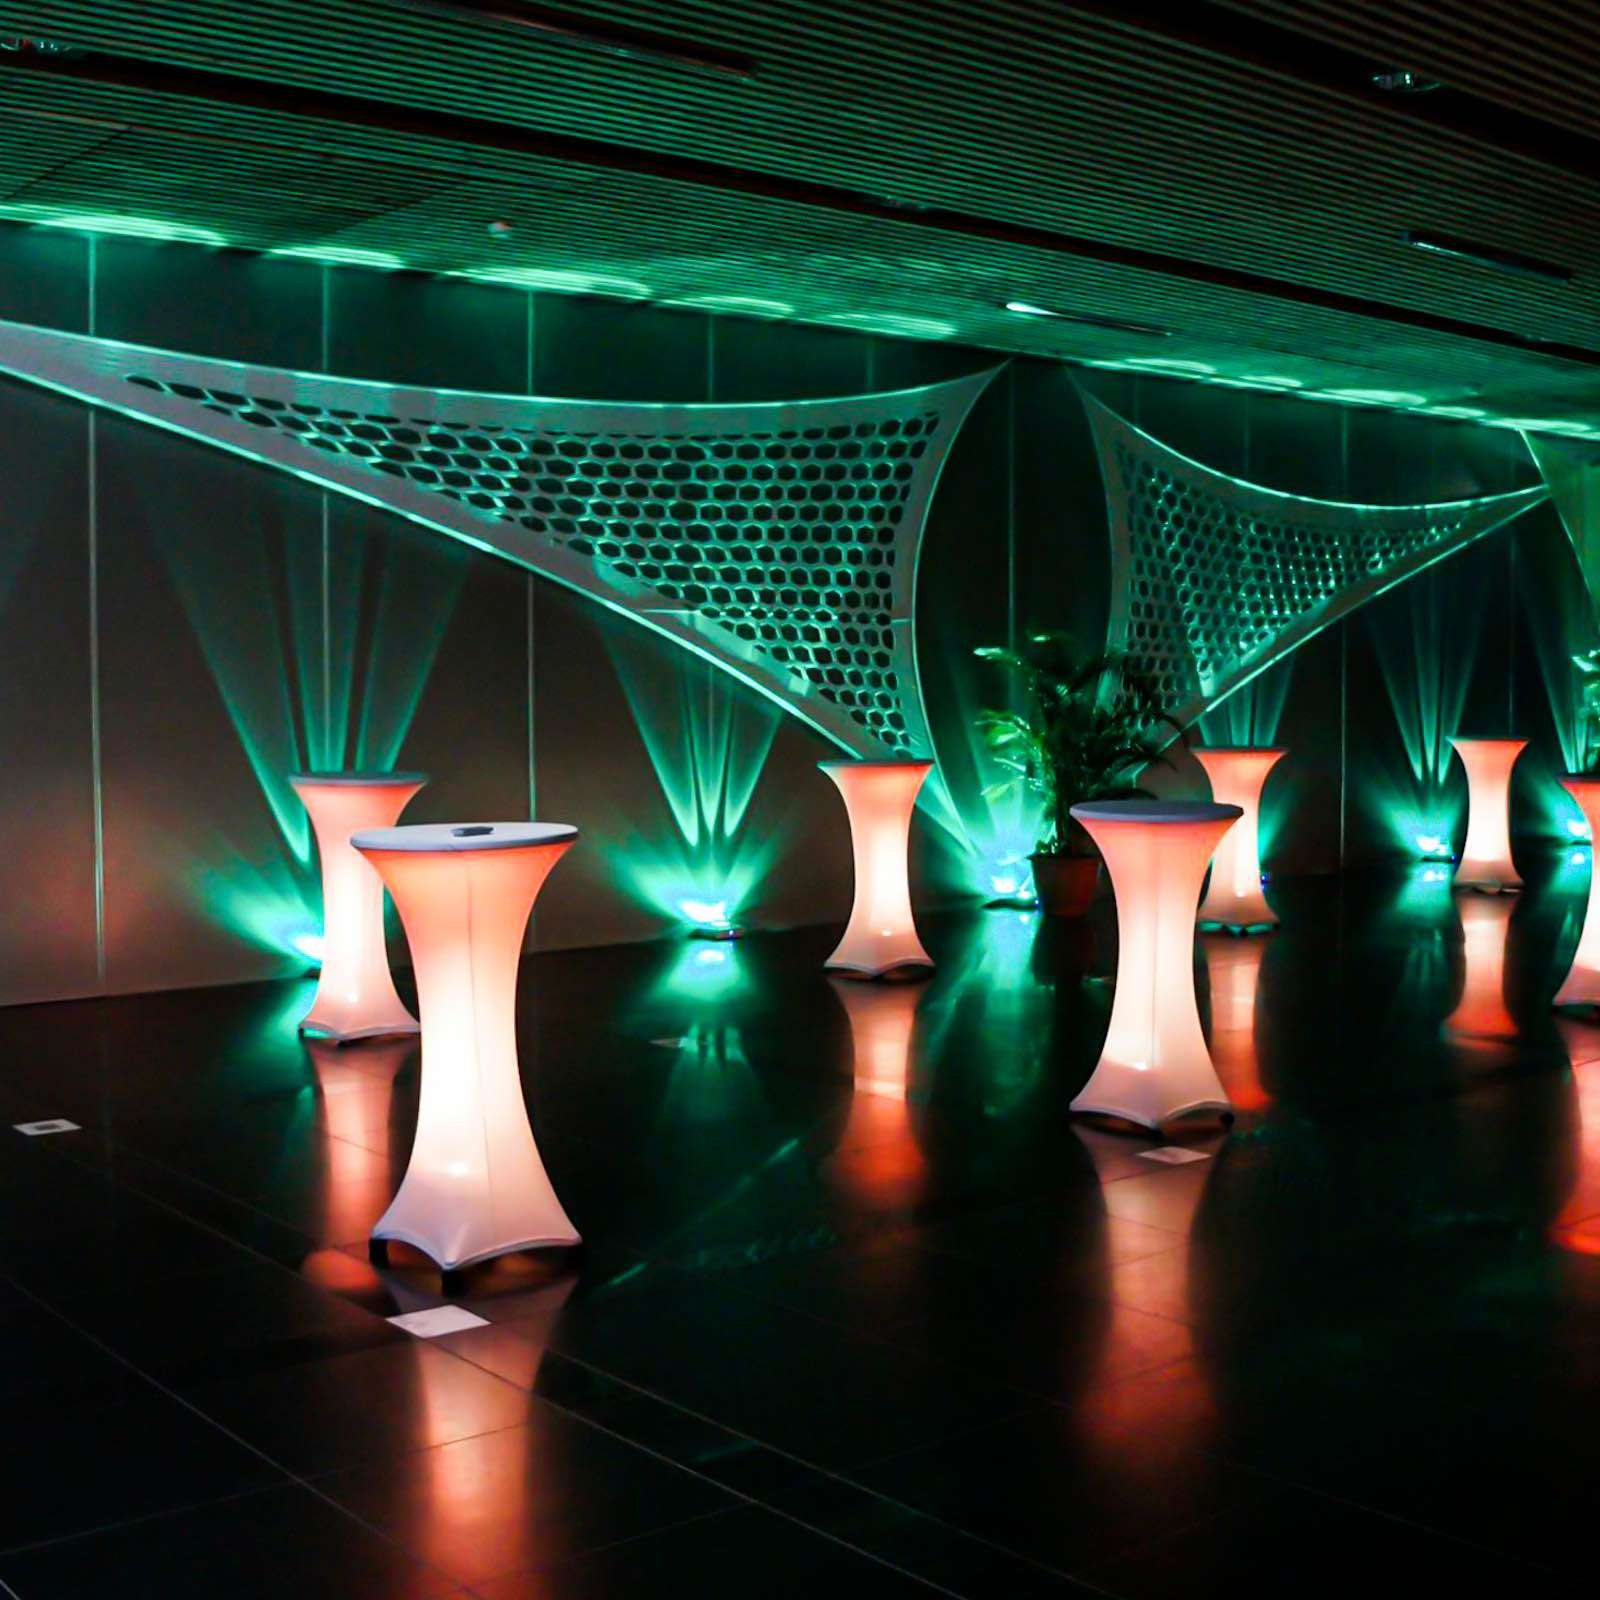 lichttechnik | Indoor | Hannover | Ambientebeleuchtung | Firmenfeier | Gala | Hochzeit | Show | Raumbeleuchtung | Akku | LED | Indoor | Spots | Scheinwerfer | Buchen | Mieten | Lehmann | Eventservice